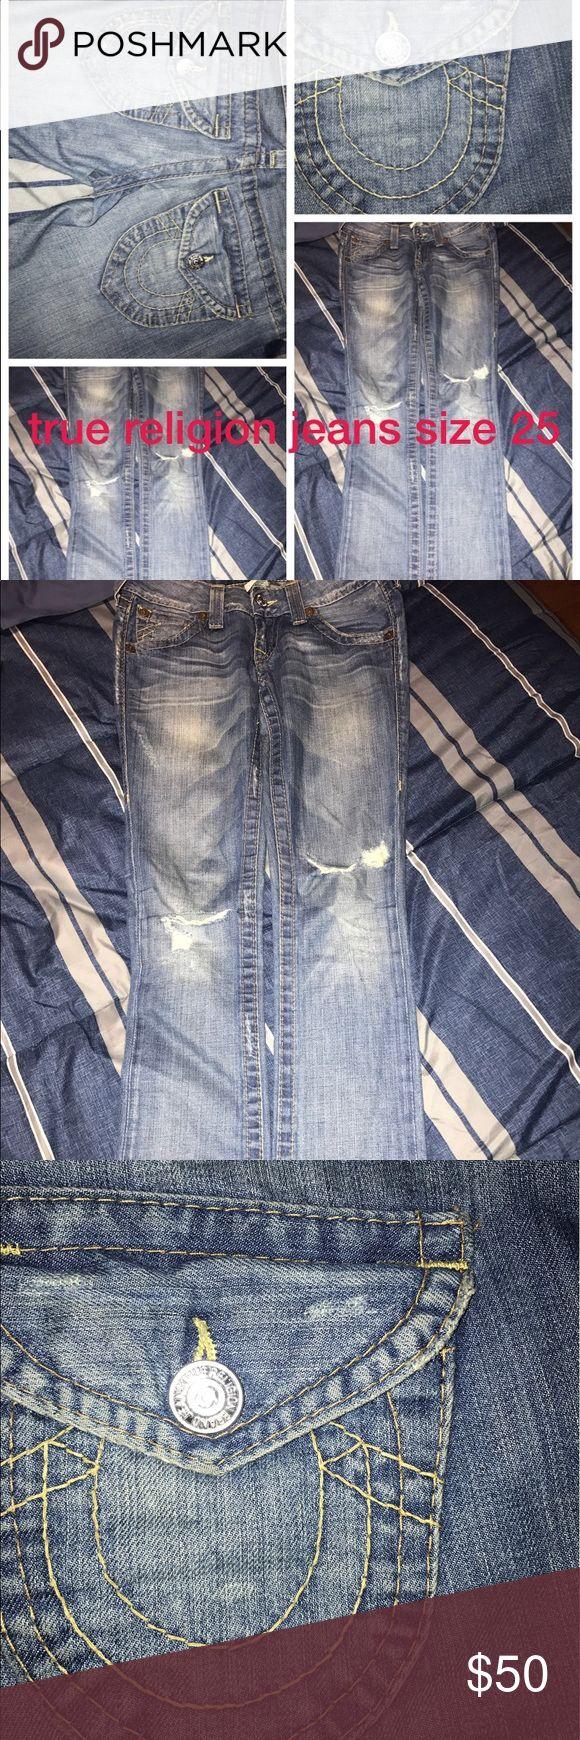 True religion Jean True religion Jeans lite blue with yellow seams. Size 25 True Religion Jeans Straight Leg